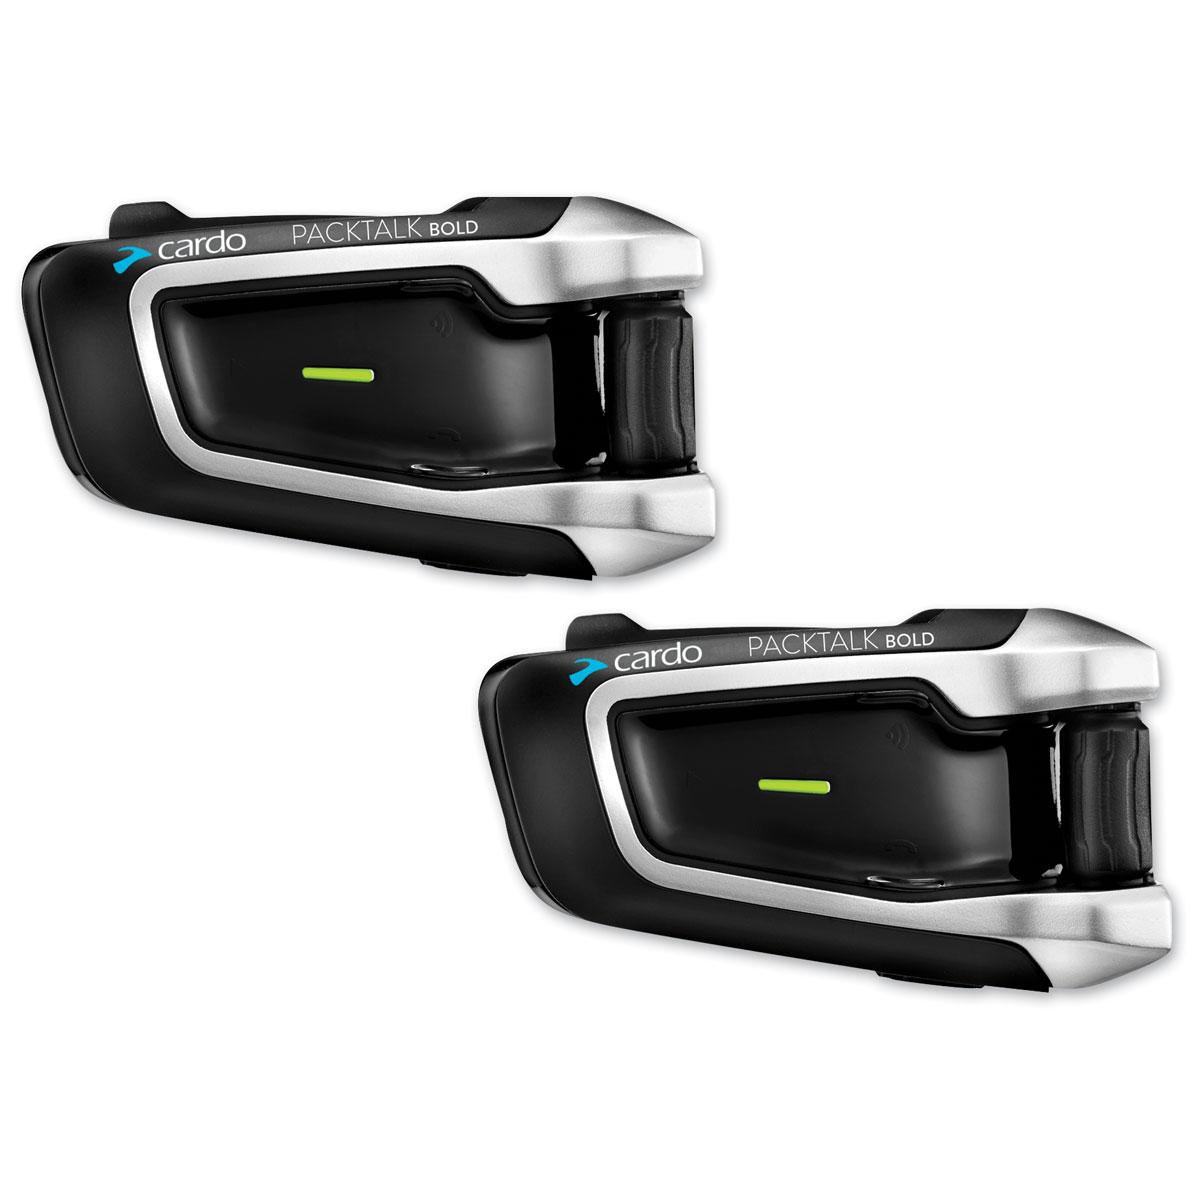 Cardo PackTalk Bold Headset - Duo Pack